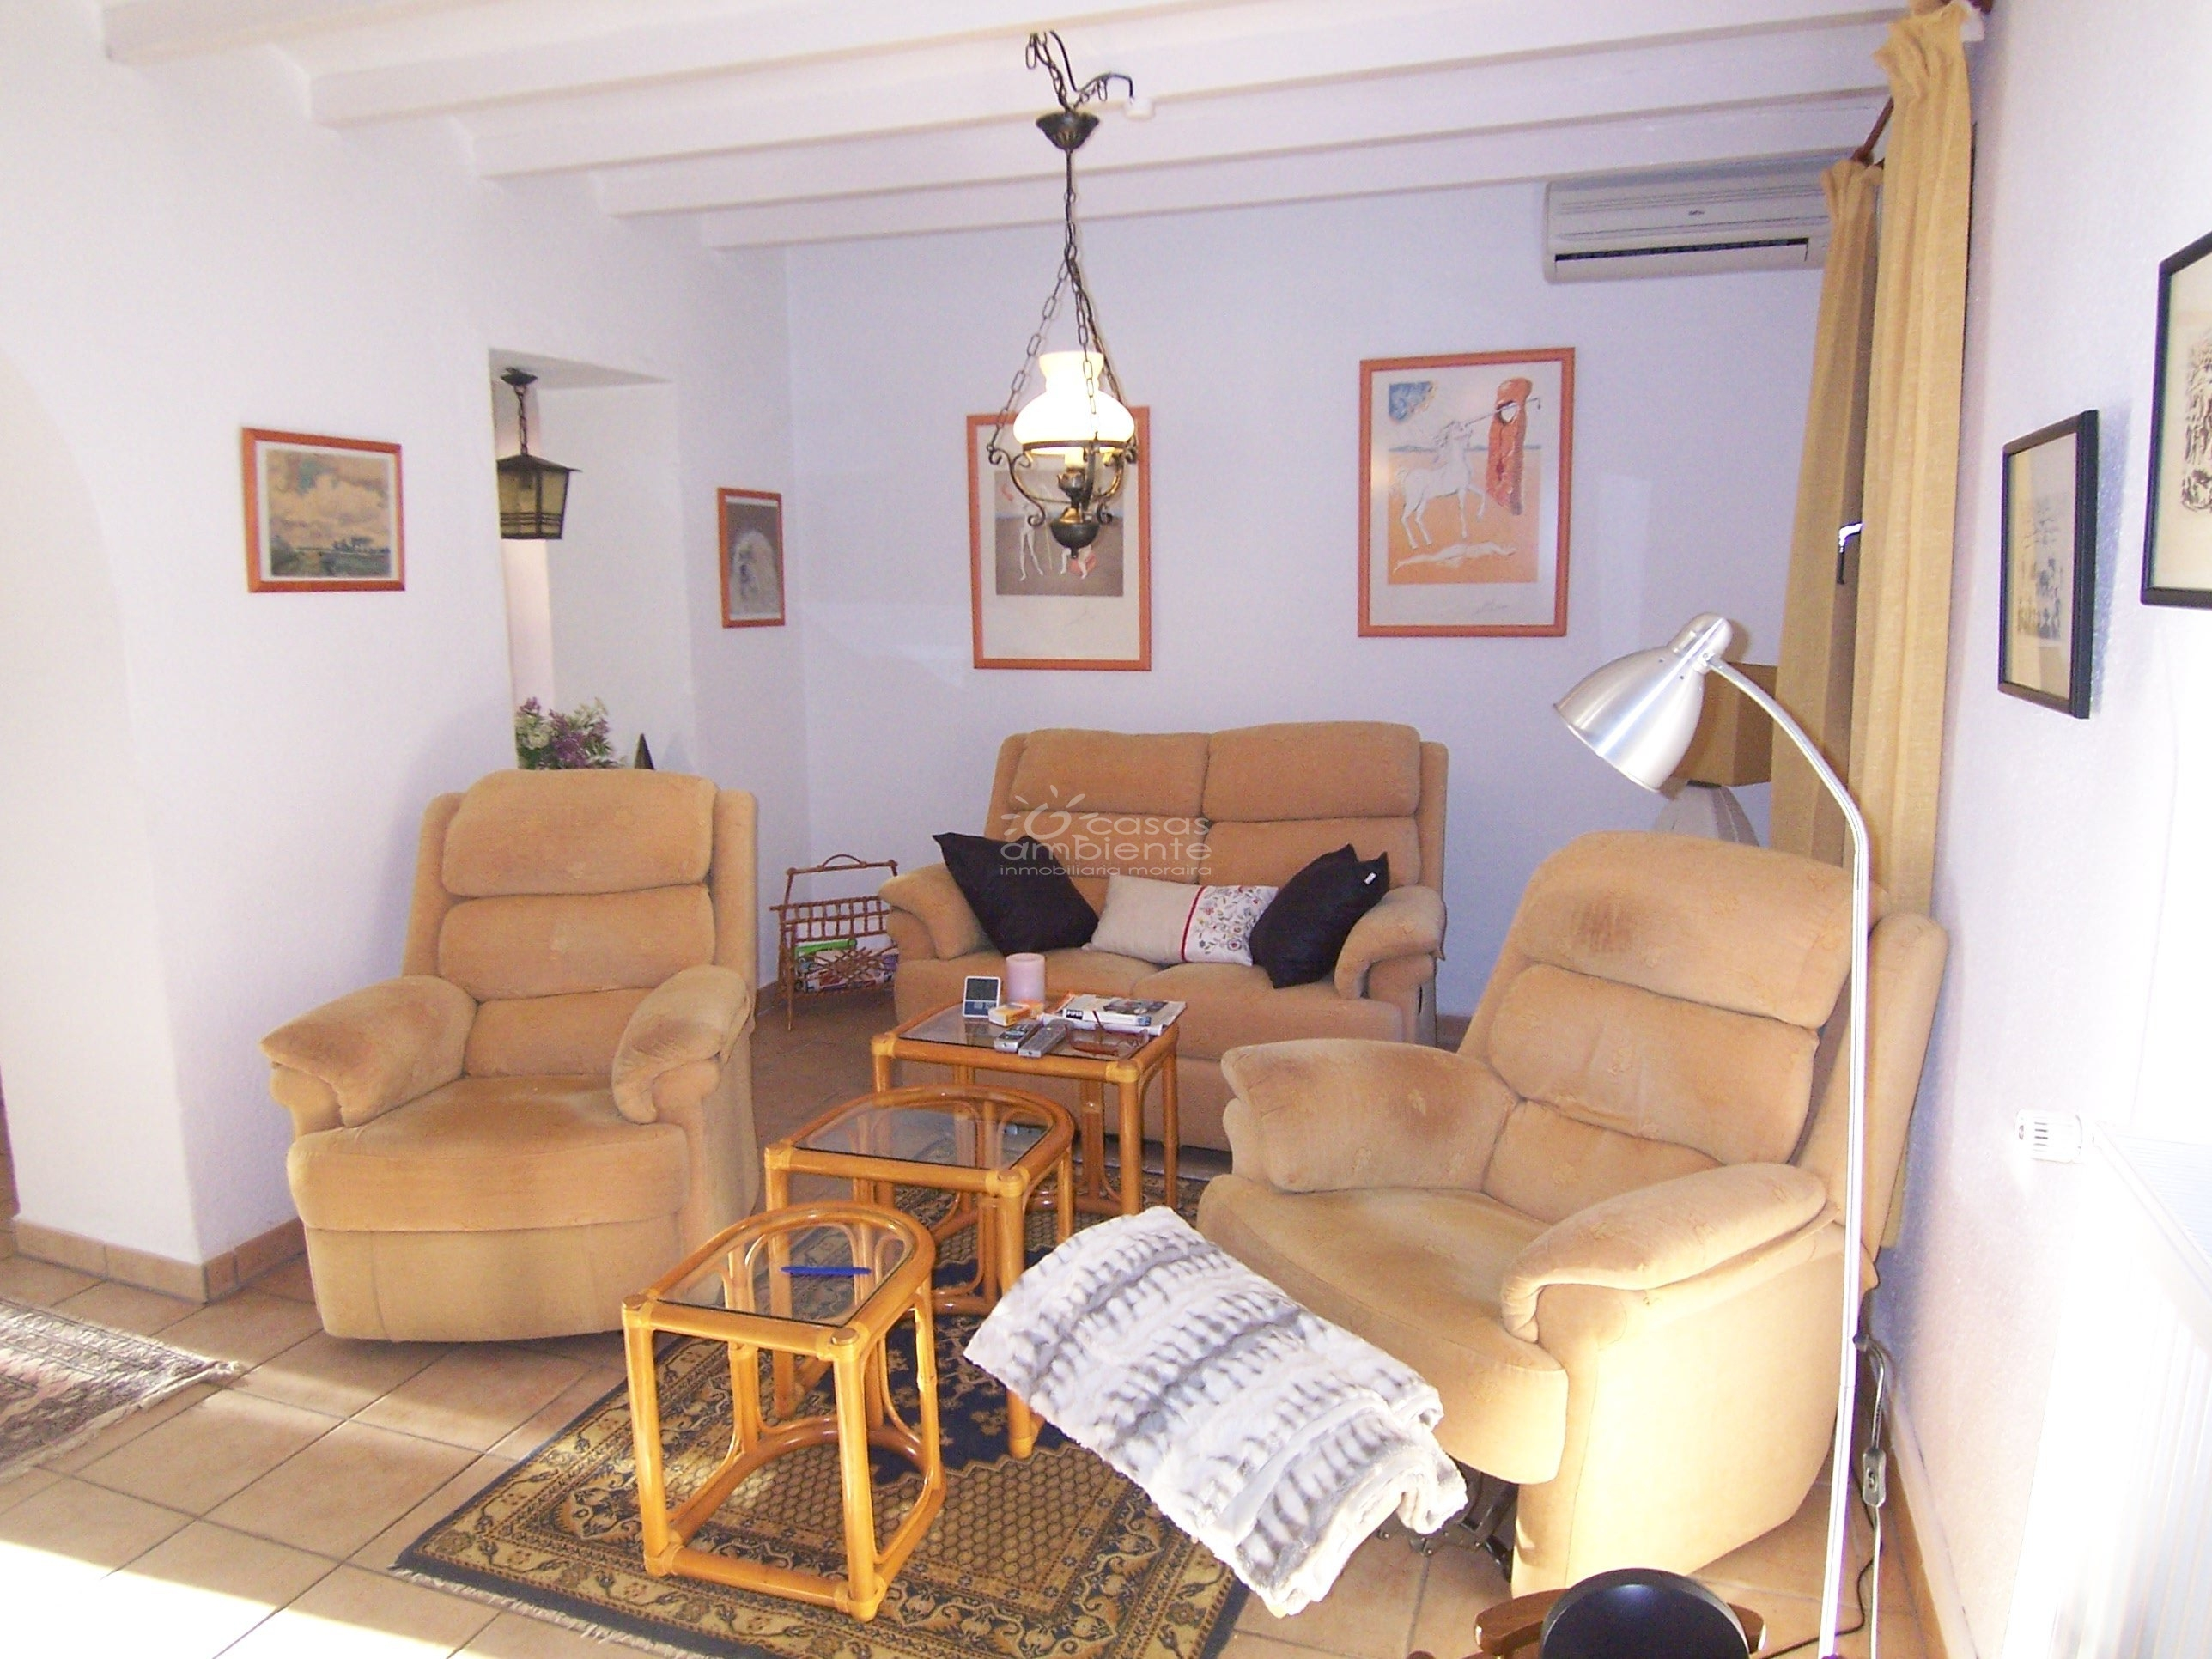 Reventas Finca Casa De Campo Teula  # Muebles Segunda Mano Teulada